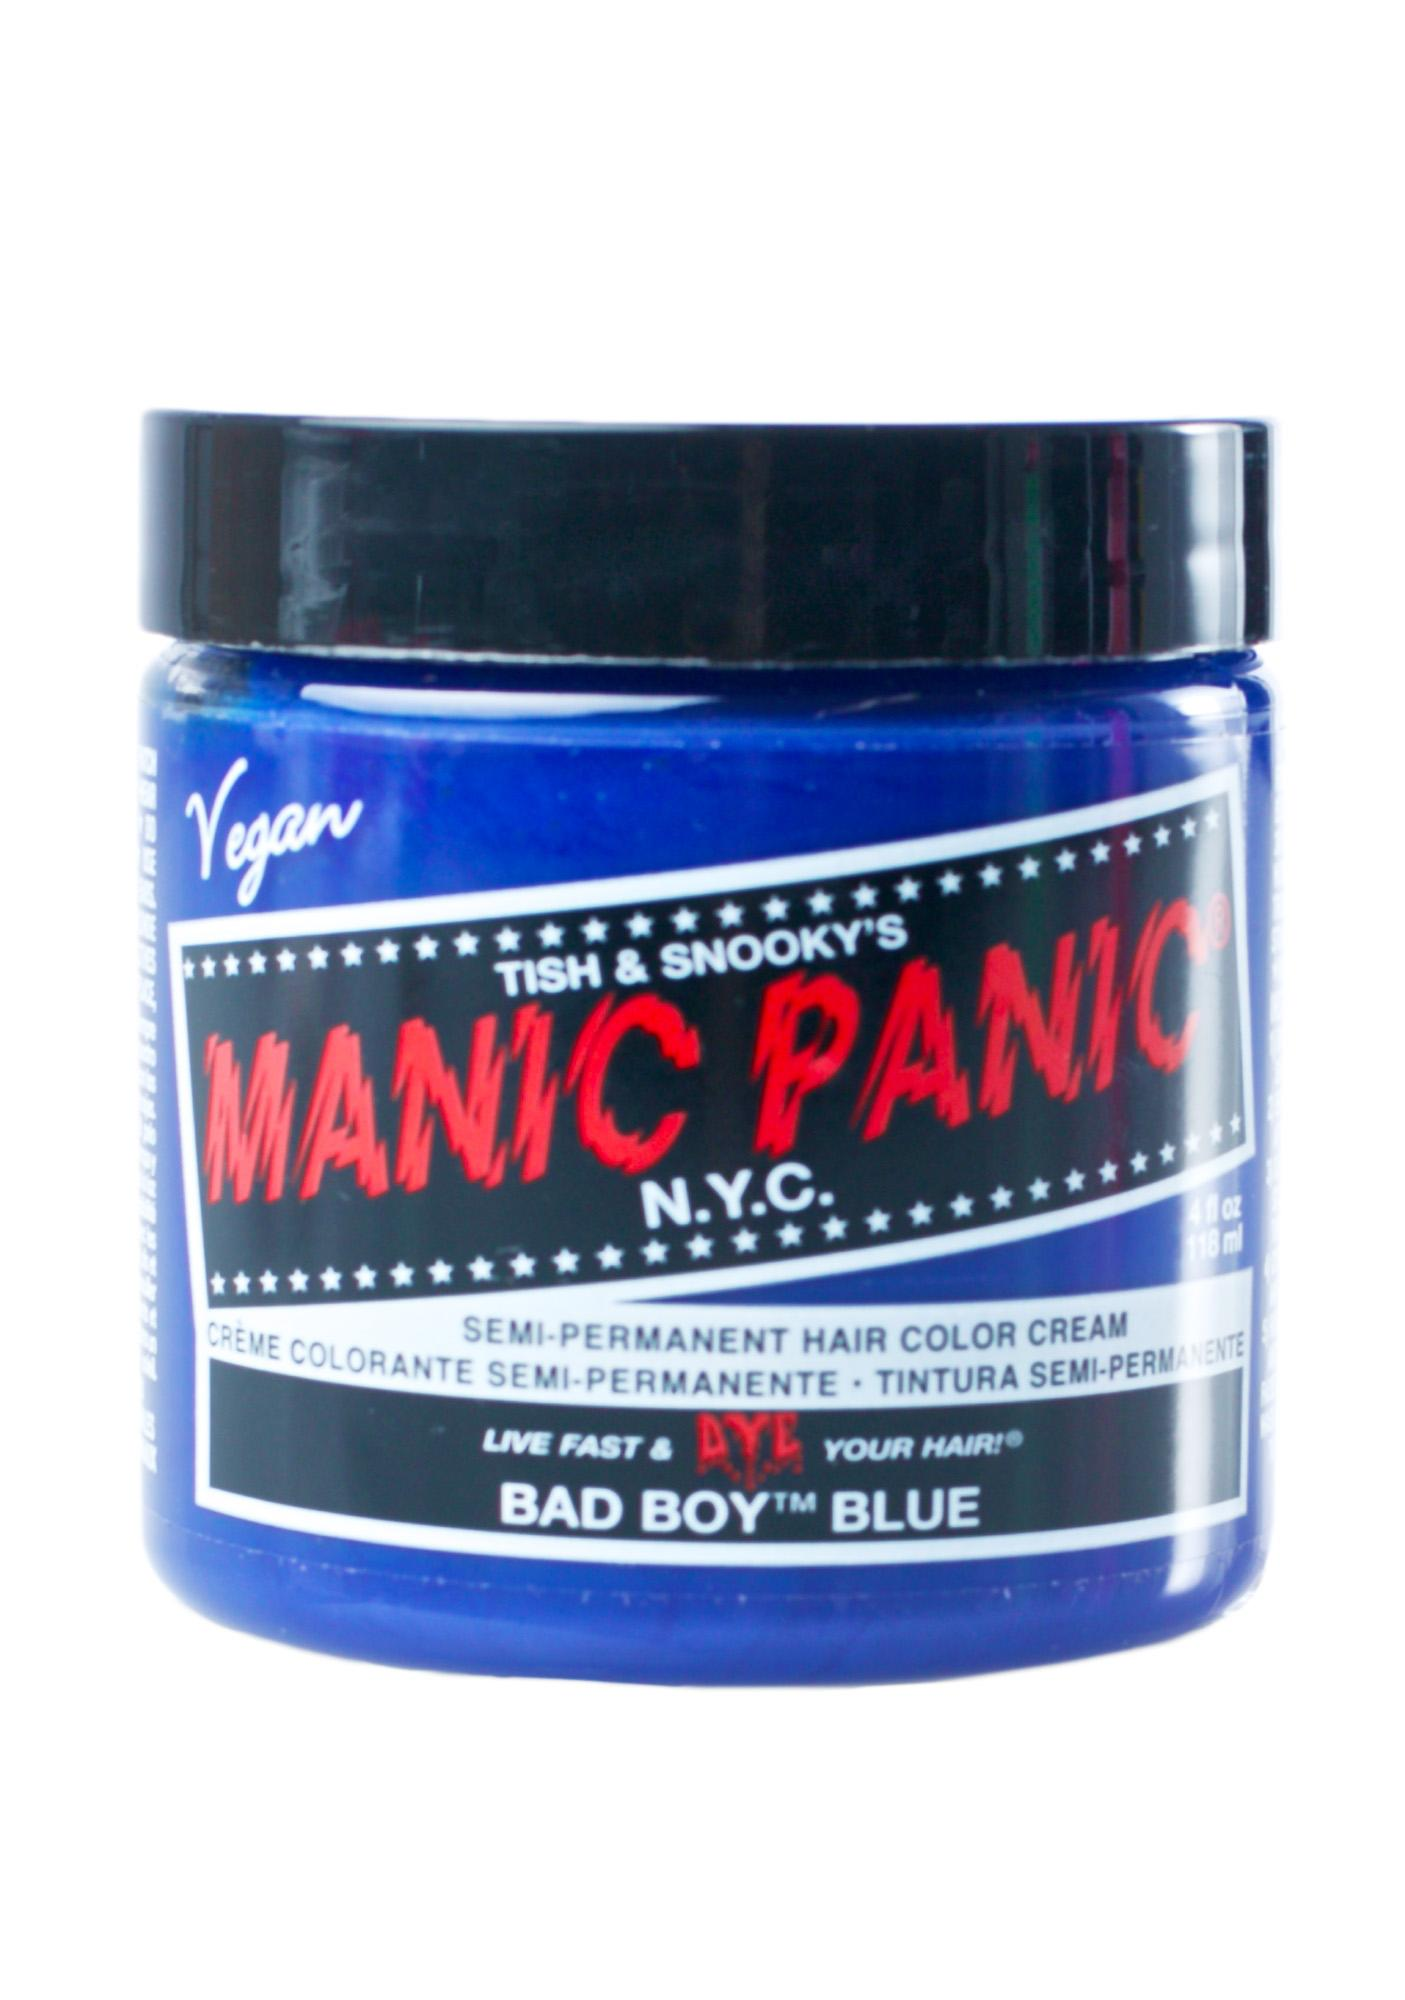 Manic Panic Bad Boy Blue High Voltage Hair Dye